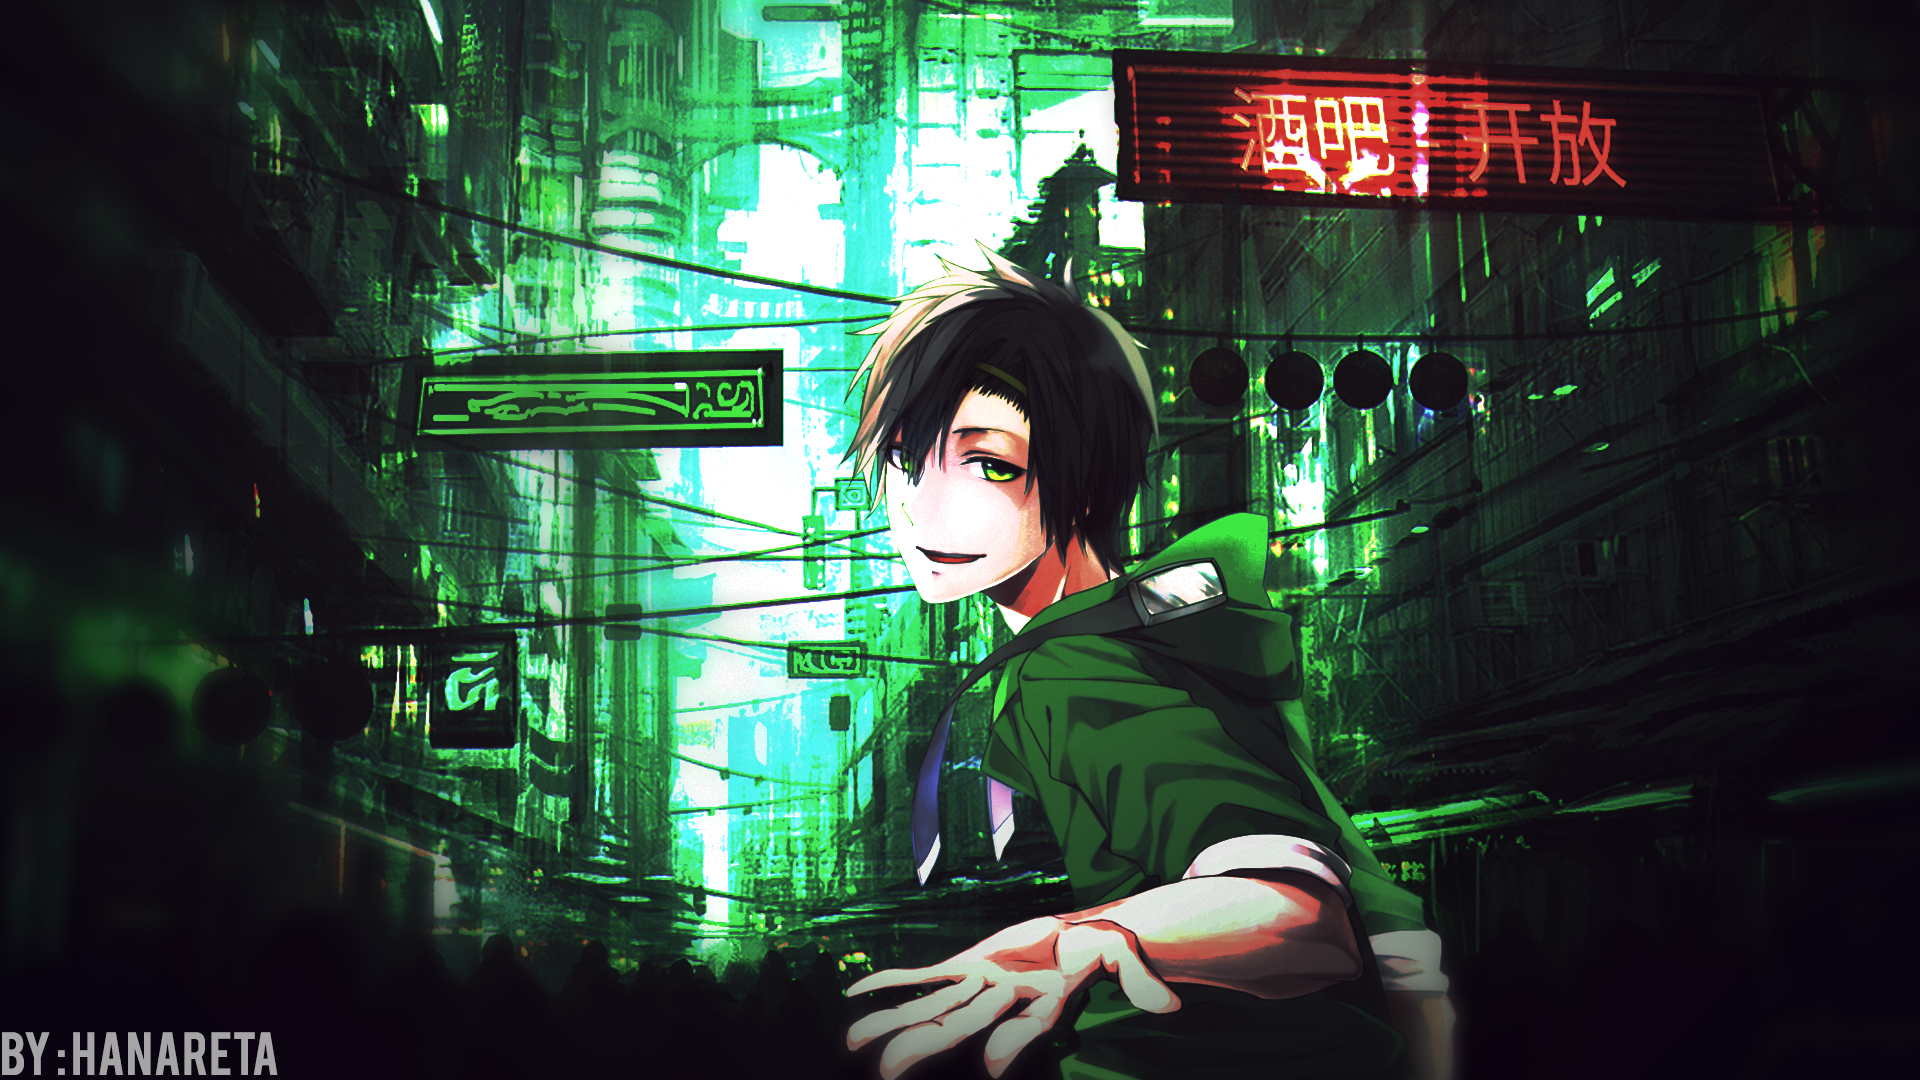 Downtown Anime Wallpaper Hd Hd Duvar Kağıdı Arka Plan